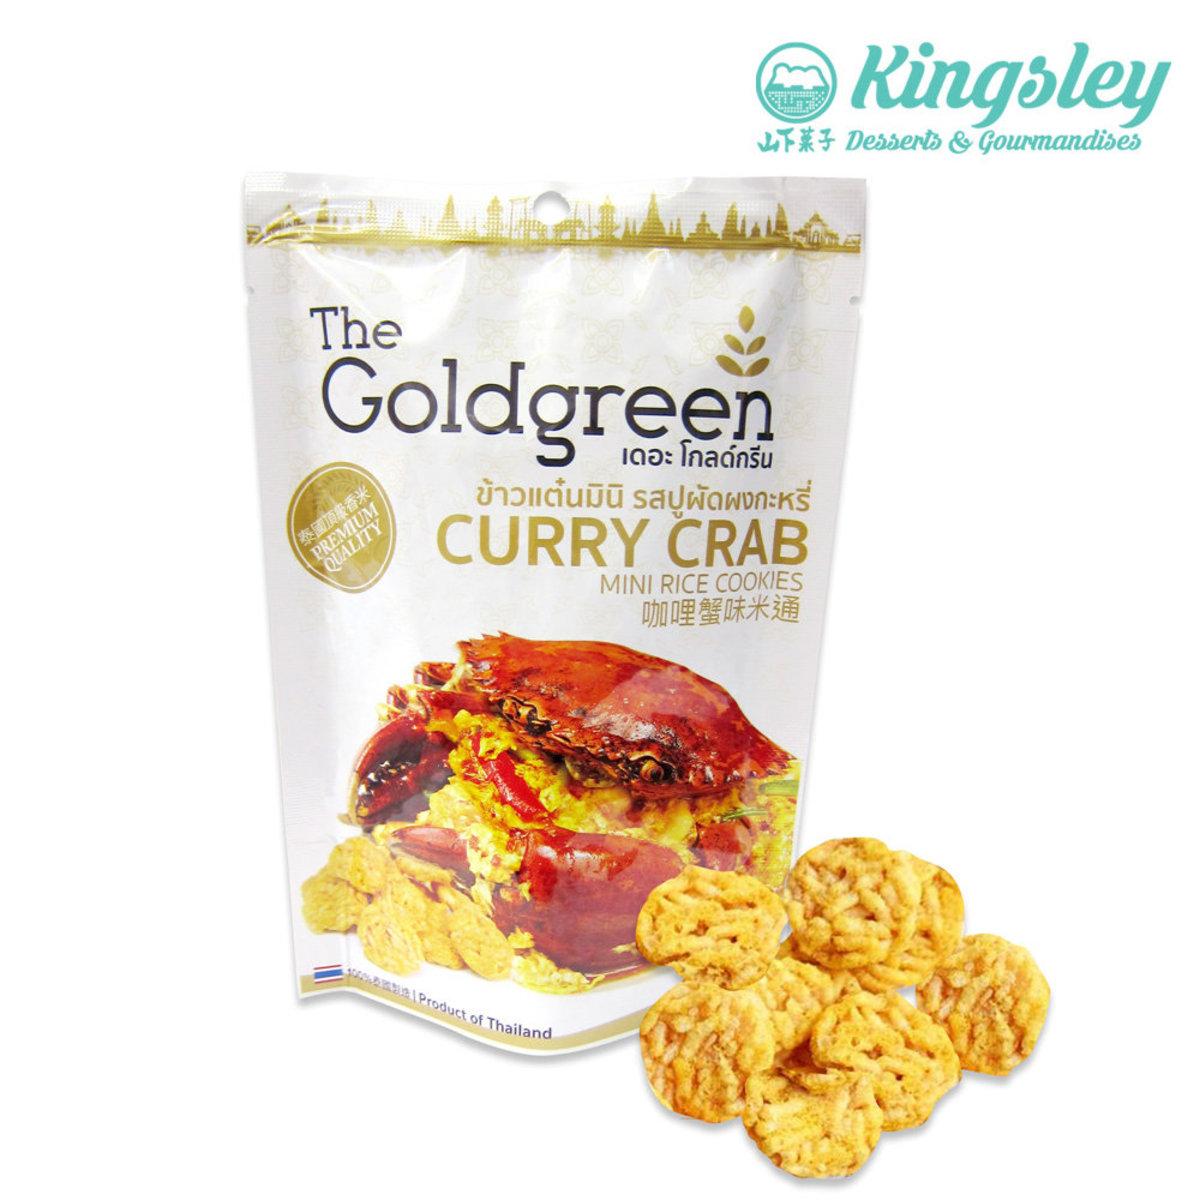 Mini Rice Cookies Curry Crab 4 packs